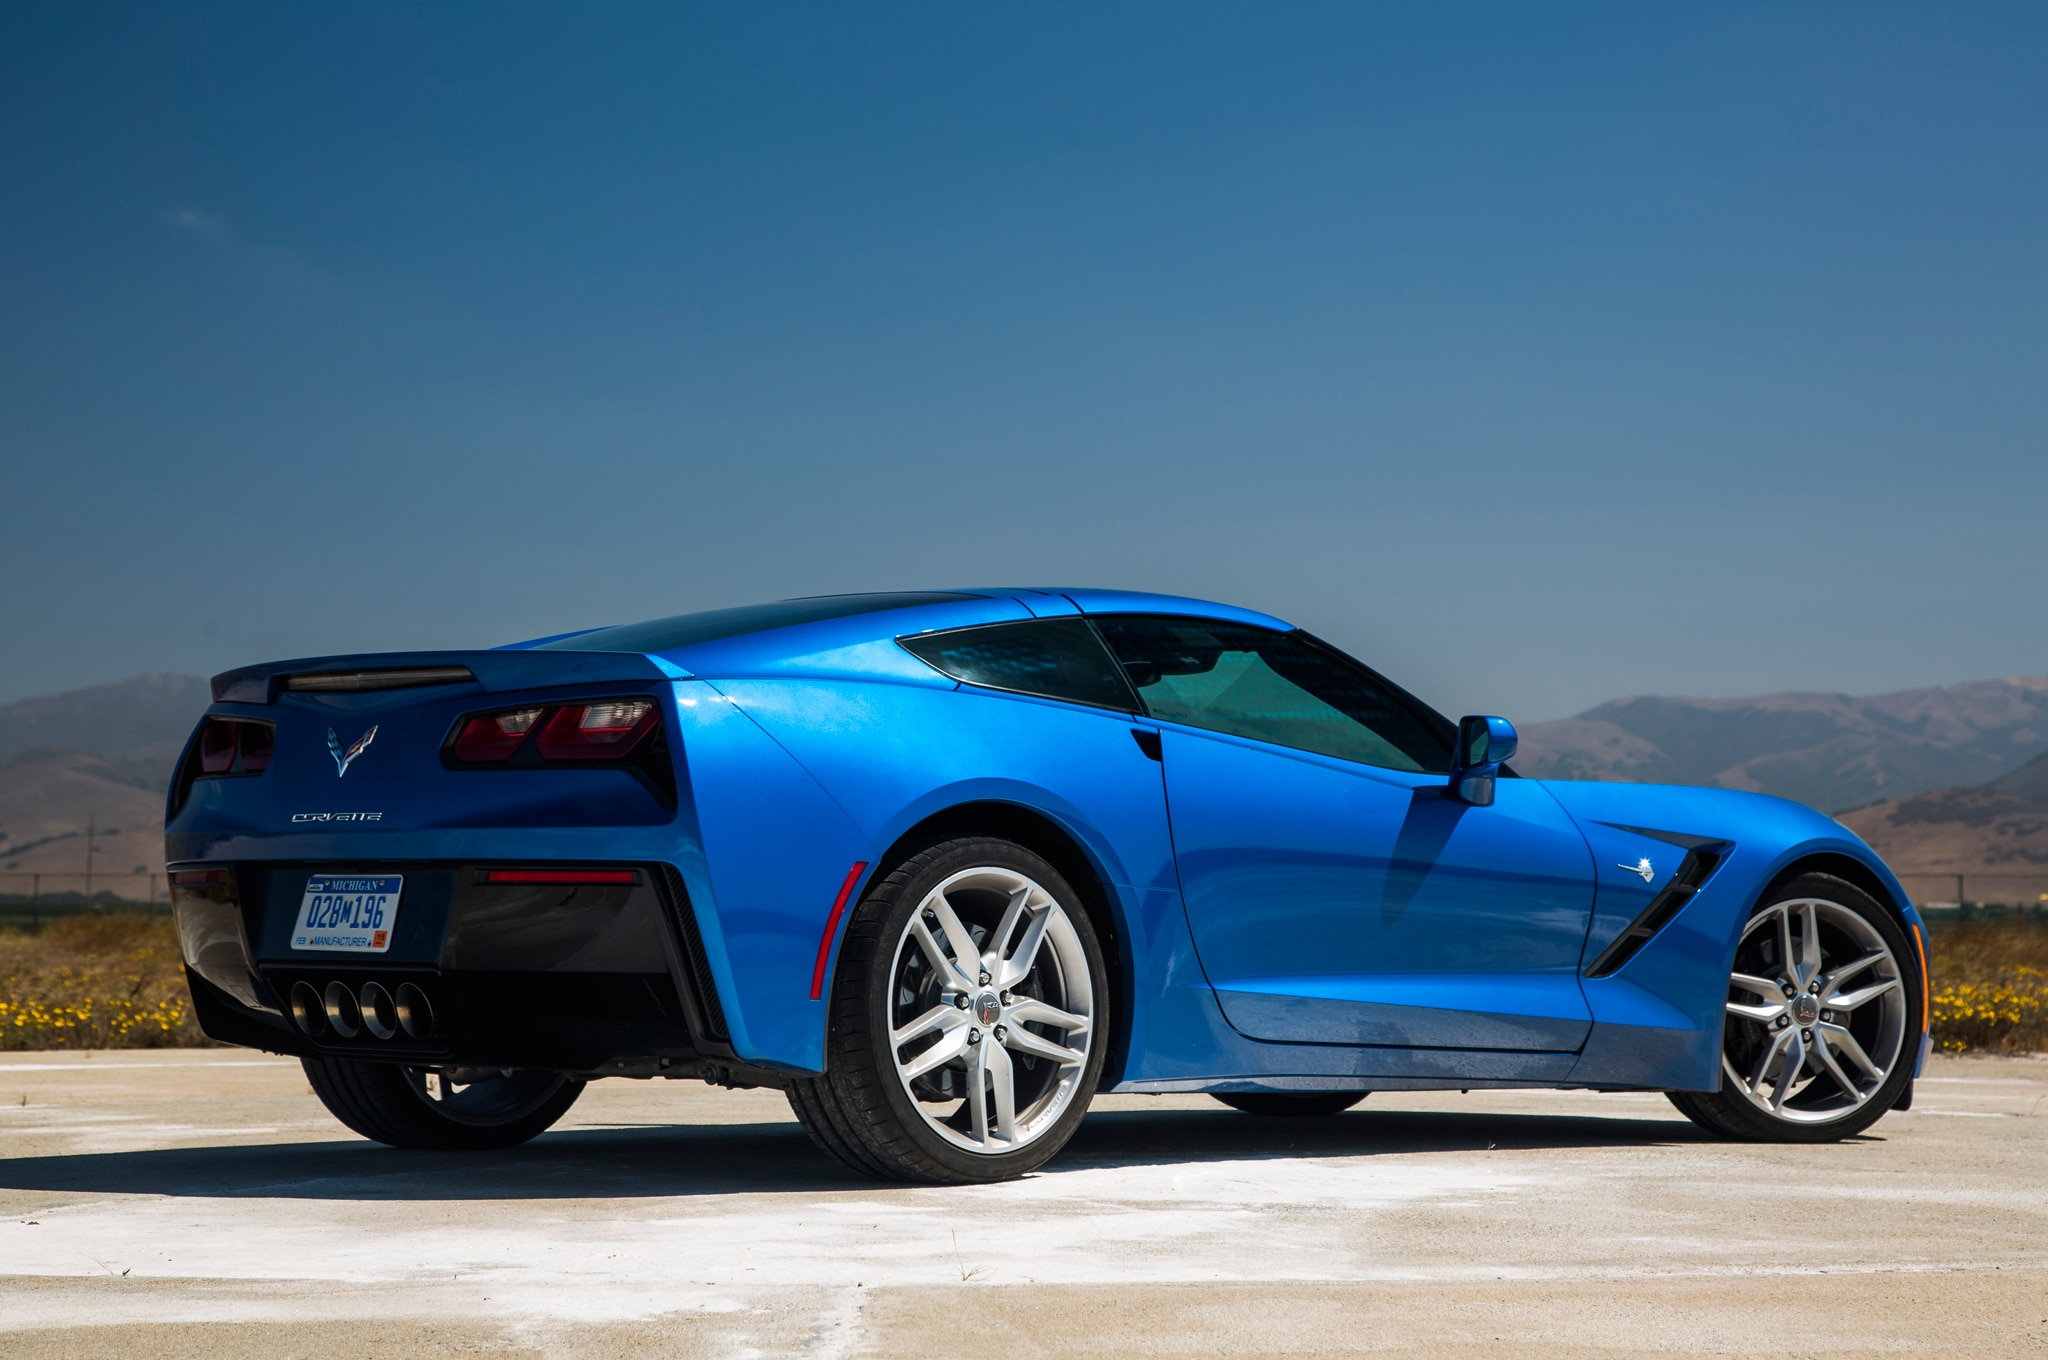 2014 Chevrolet Corvette Stingray Z51 25250